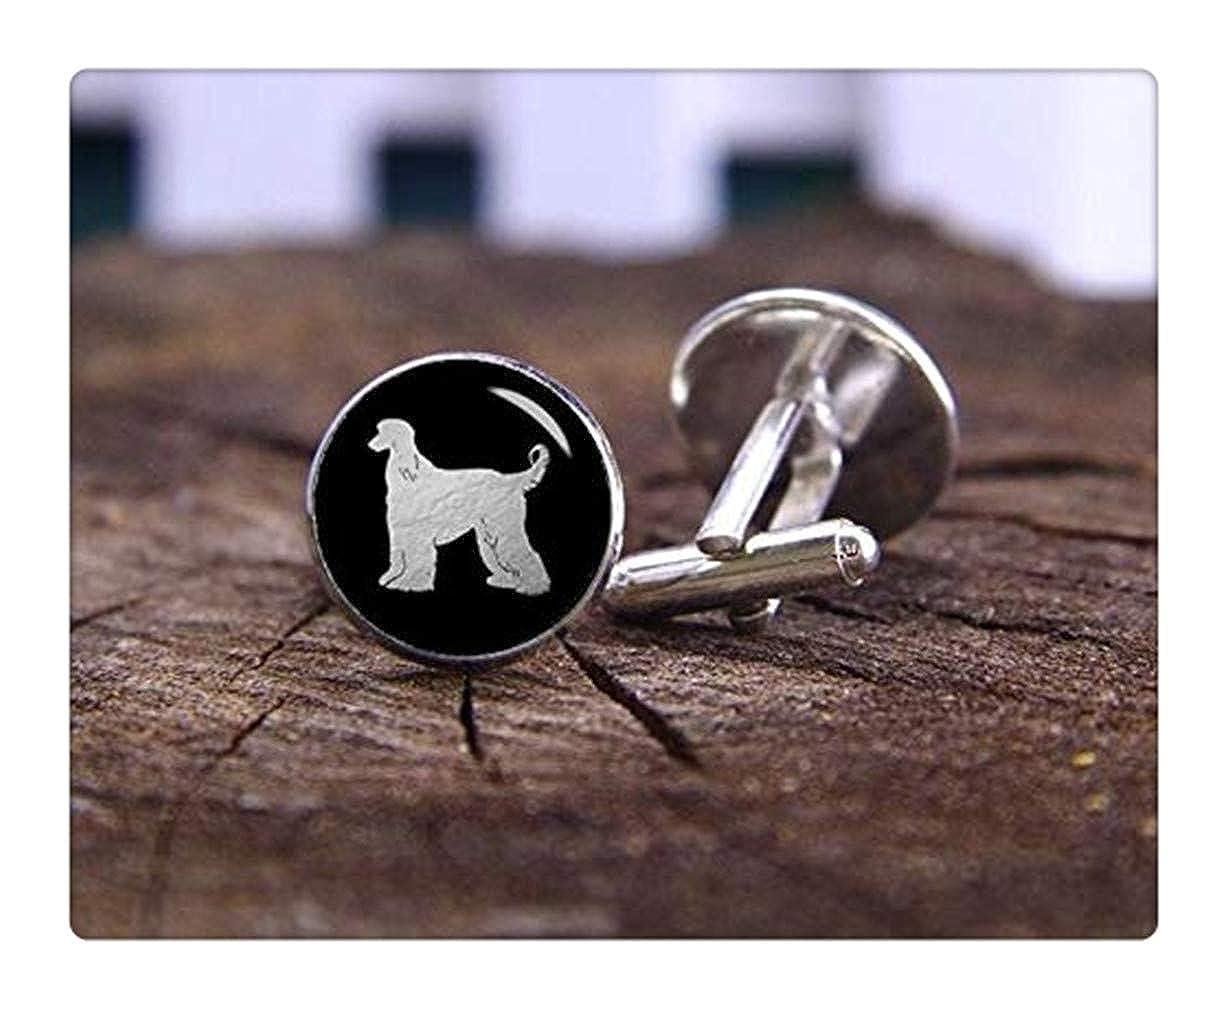 Death Devil Art Picture Cufflinks,French Bulldog Cufflinks Dog Cufflinks French Bulldog Cuff Links French Bulldog